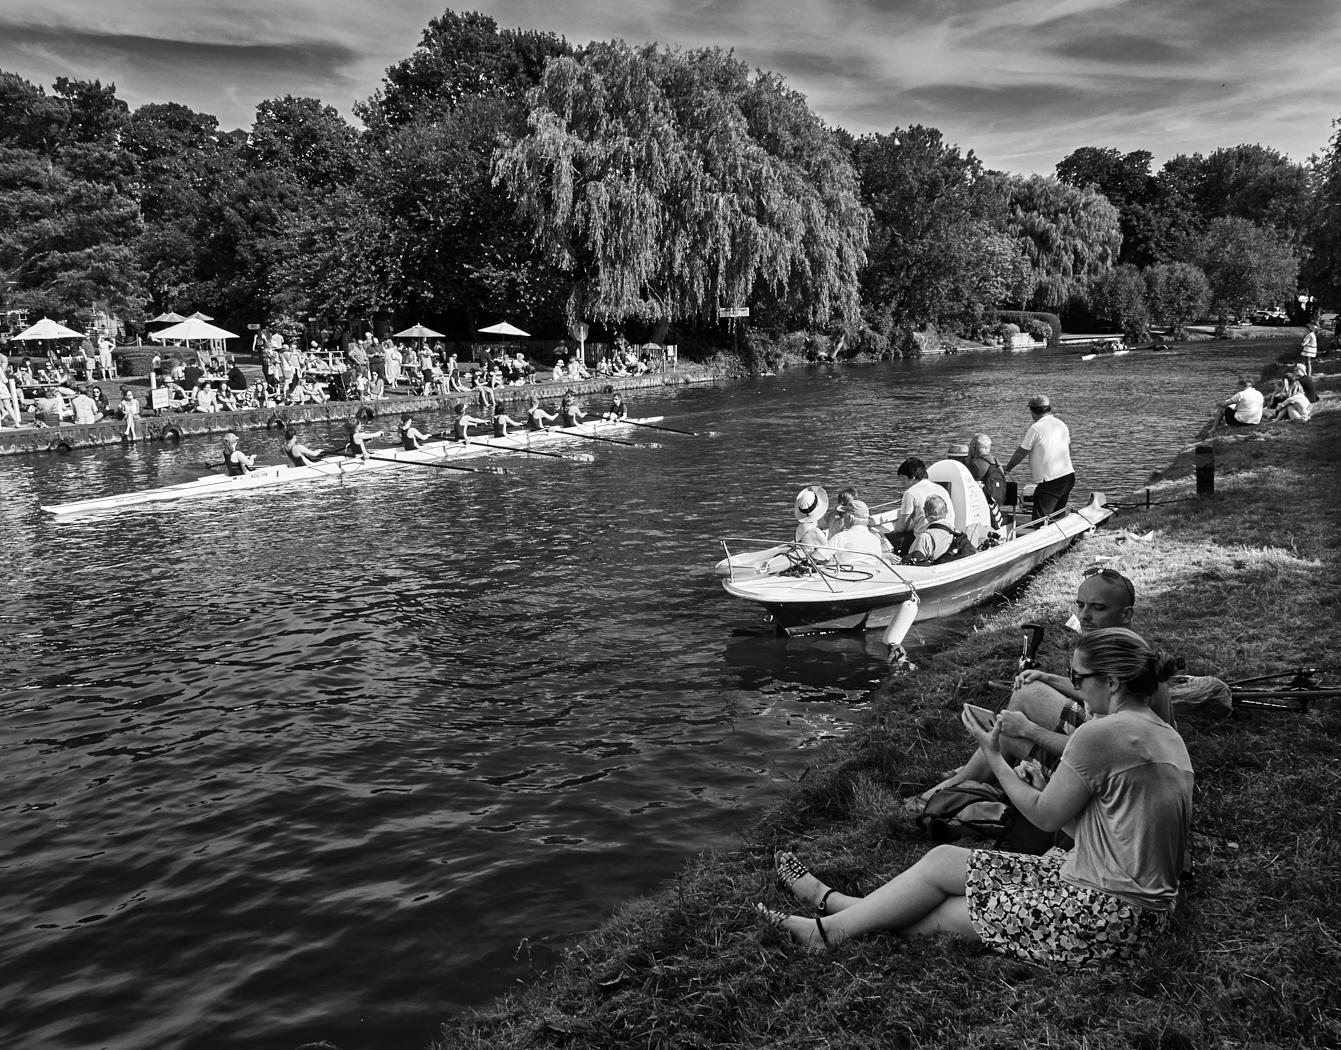 Watching the rowing21400x1050 sRGB.jpg